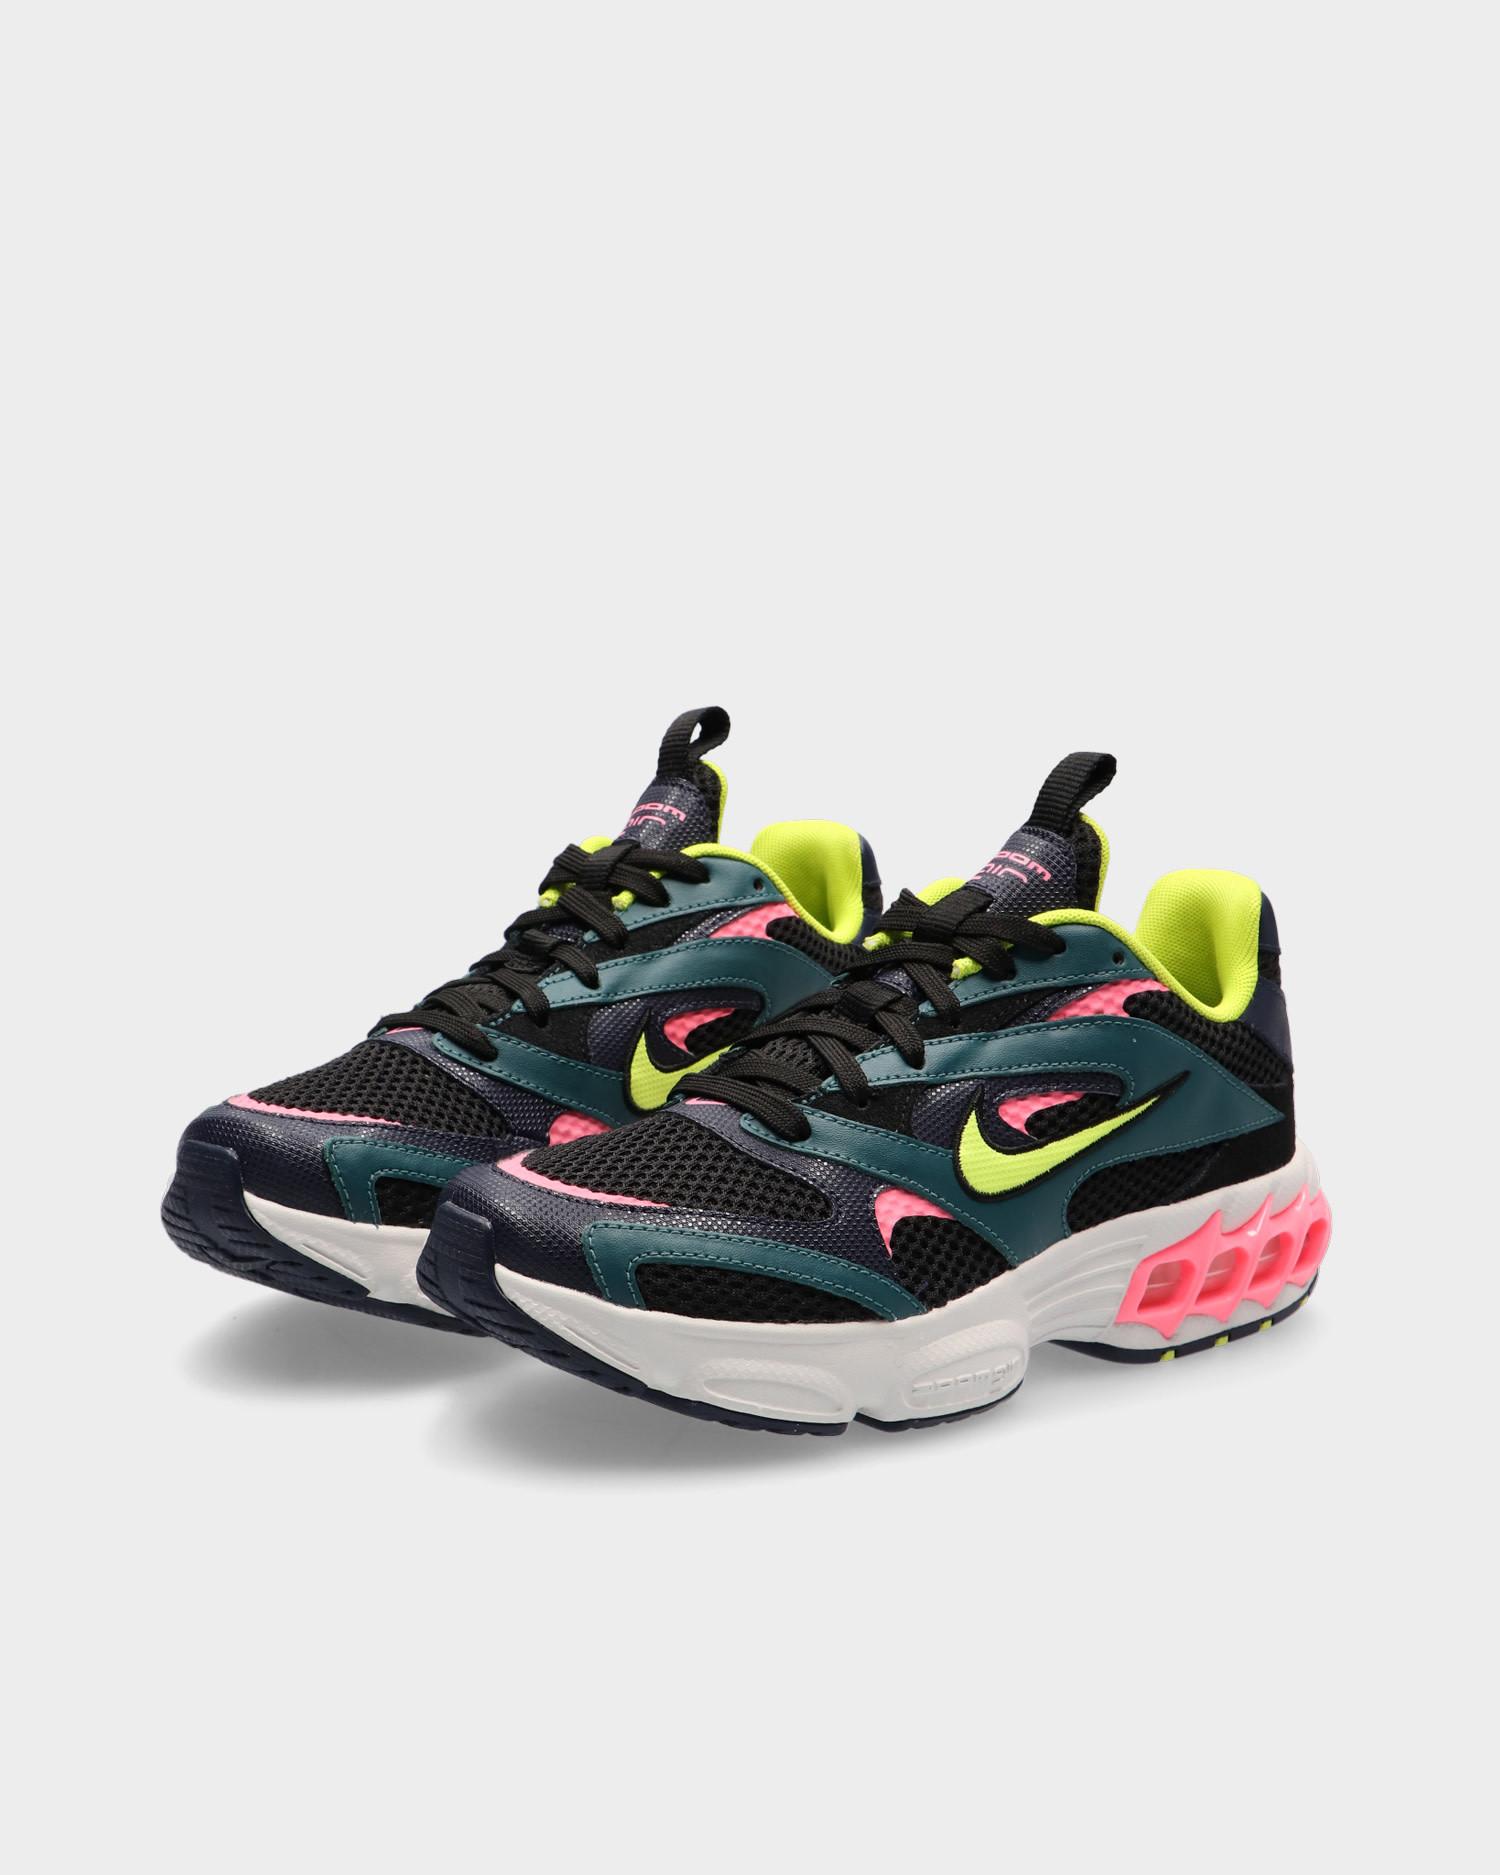 Nike Zoom Air Fire Dark Teal Green/ Cyber - Blackened Blue